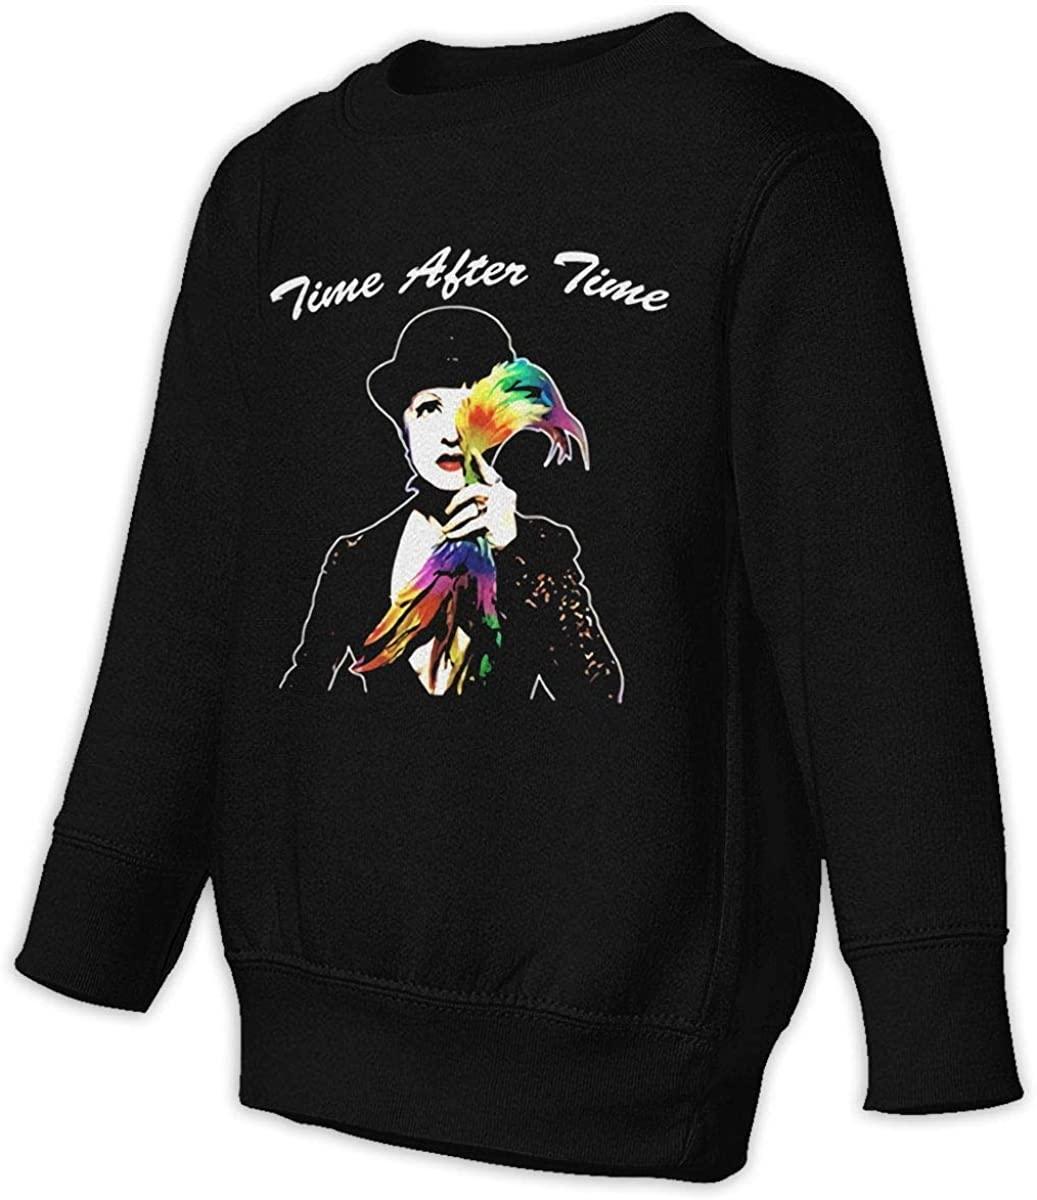 LSHLKJDFN Cyndi Lauper Unisex Sweatshirt Youth Boy and Girls Pullover Sweatshirt Black